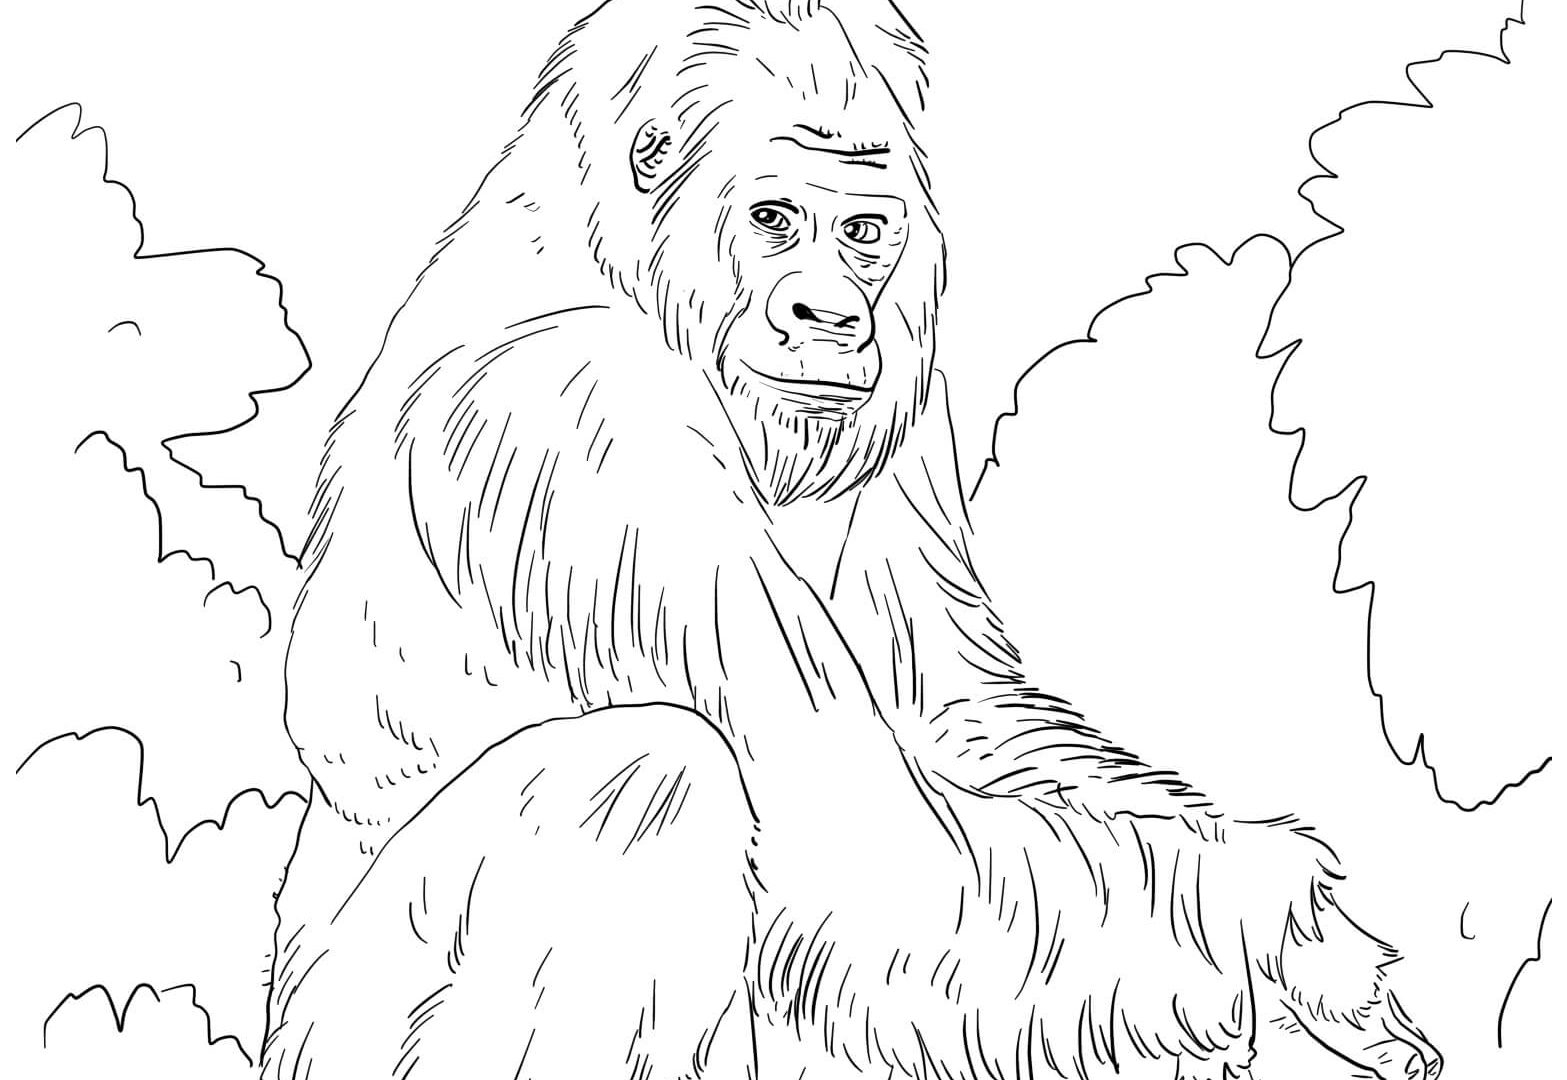 Printable Baby Orangutan Coloring Page for Kids – SupplyMe | 1080x1567